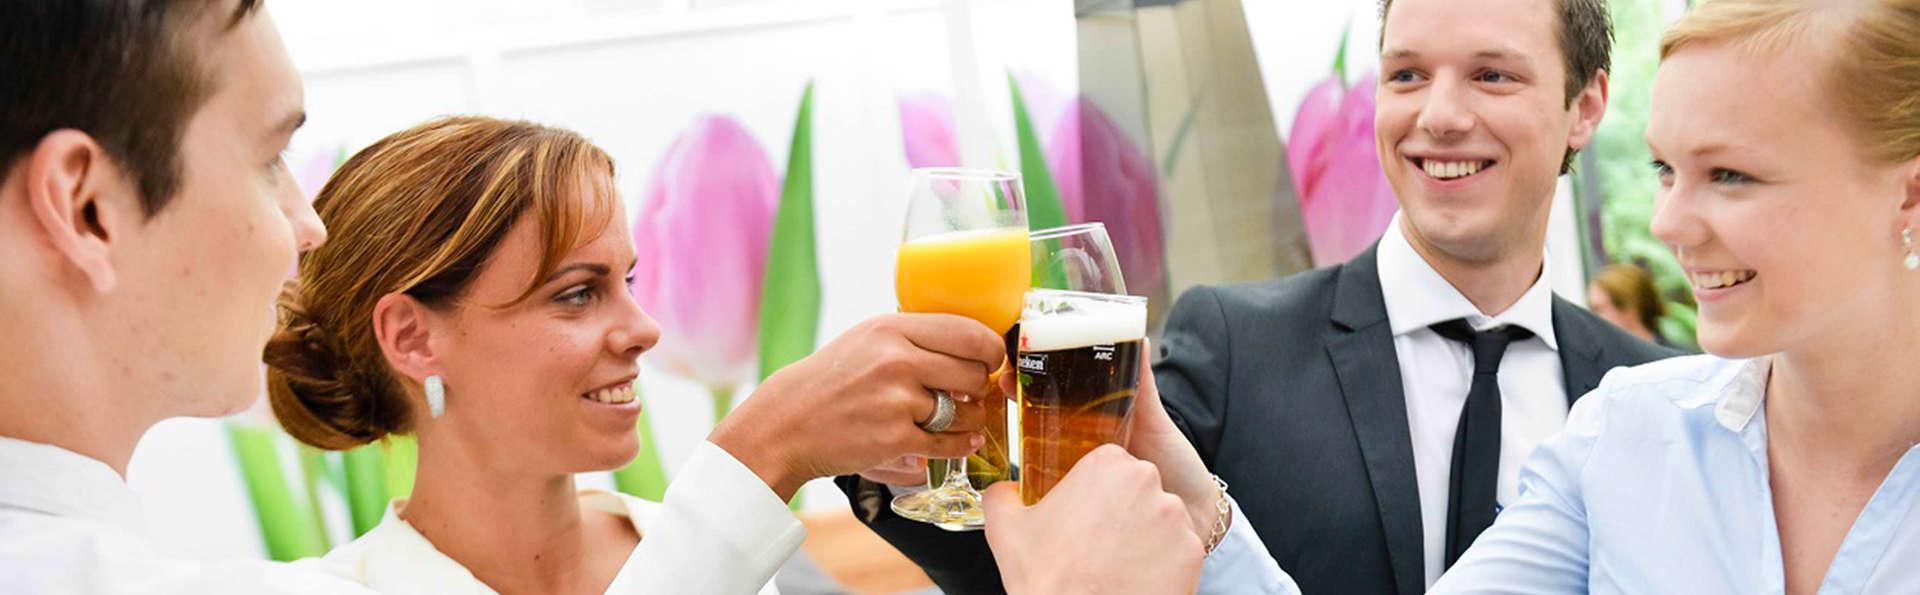 Fletcher Hotel Restaurant Amersfoort - EDIT_drinkfriends.jpg